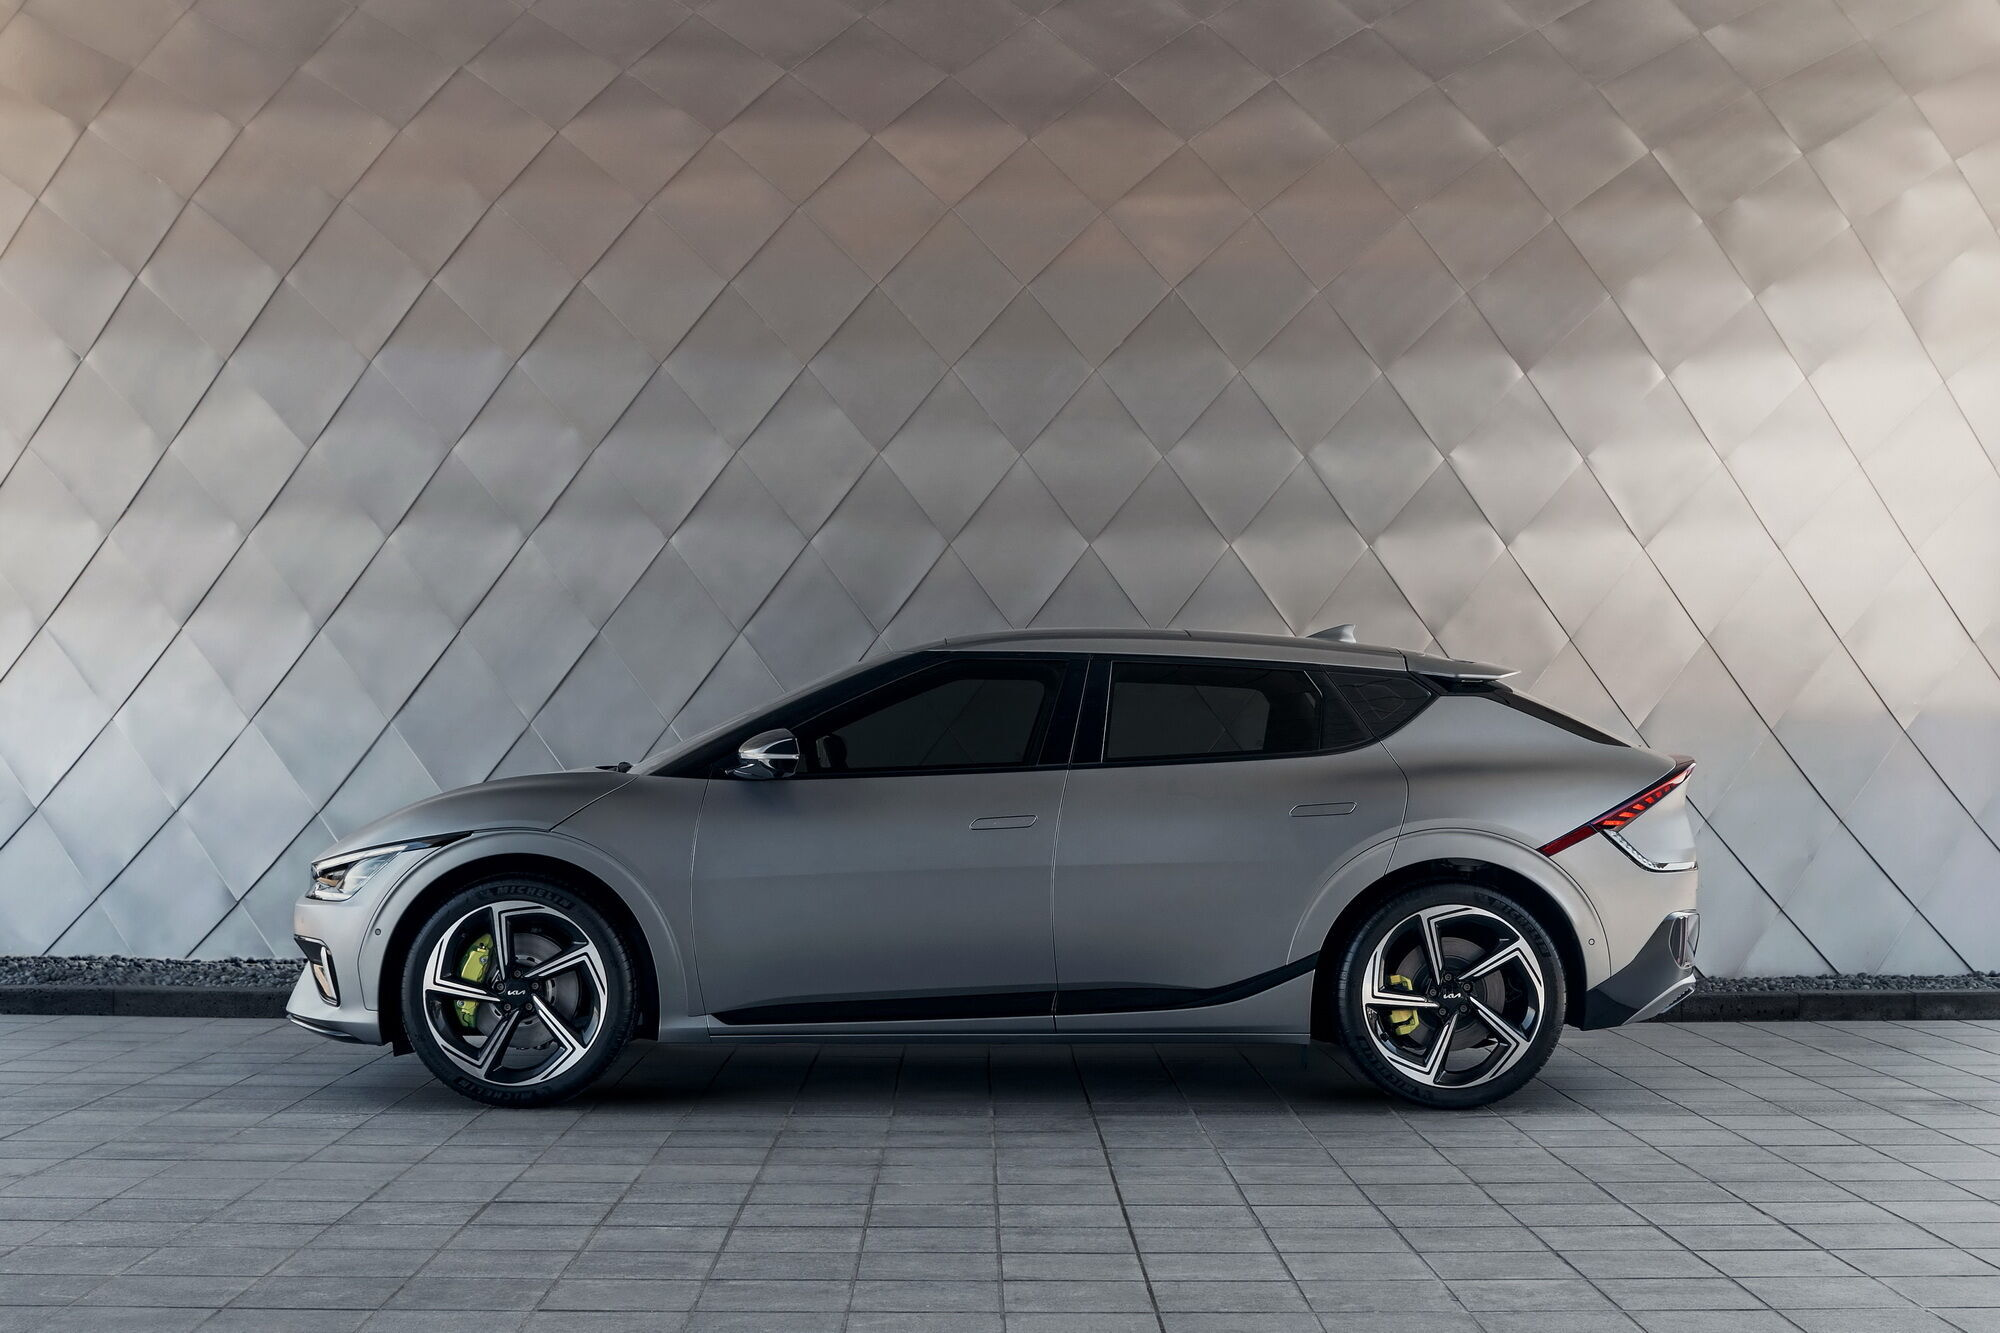 В зависимости от конфигурации EV6 и EV6 GT-Line получат батарею на 58 или 77,4 кВтч